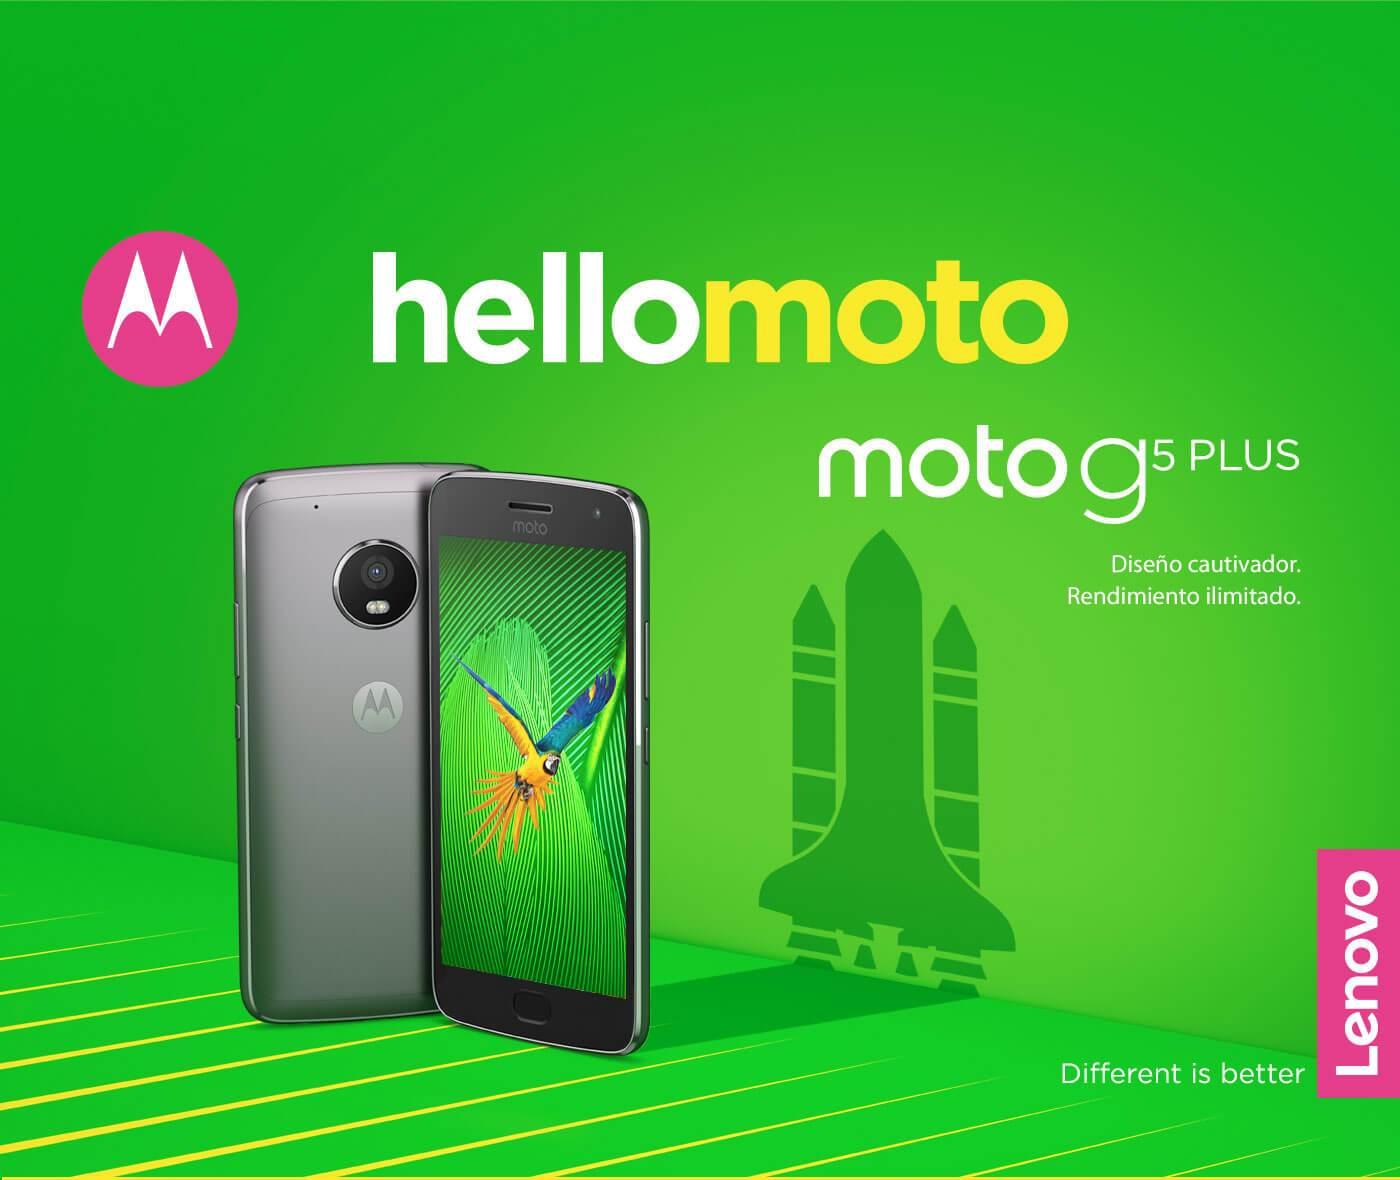 Lenovo Moto launches new devices Moto G5, Moto G5 Plus